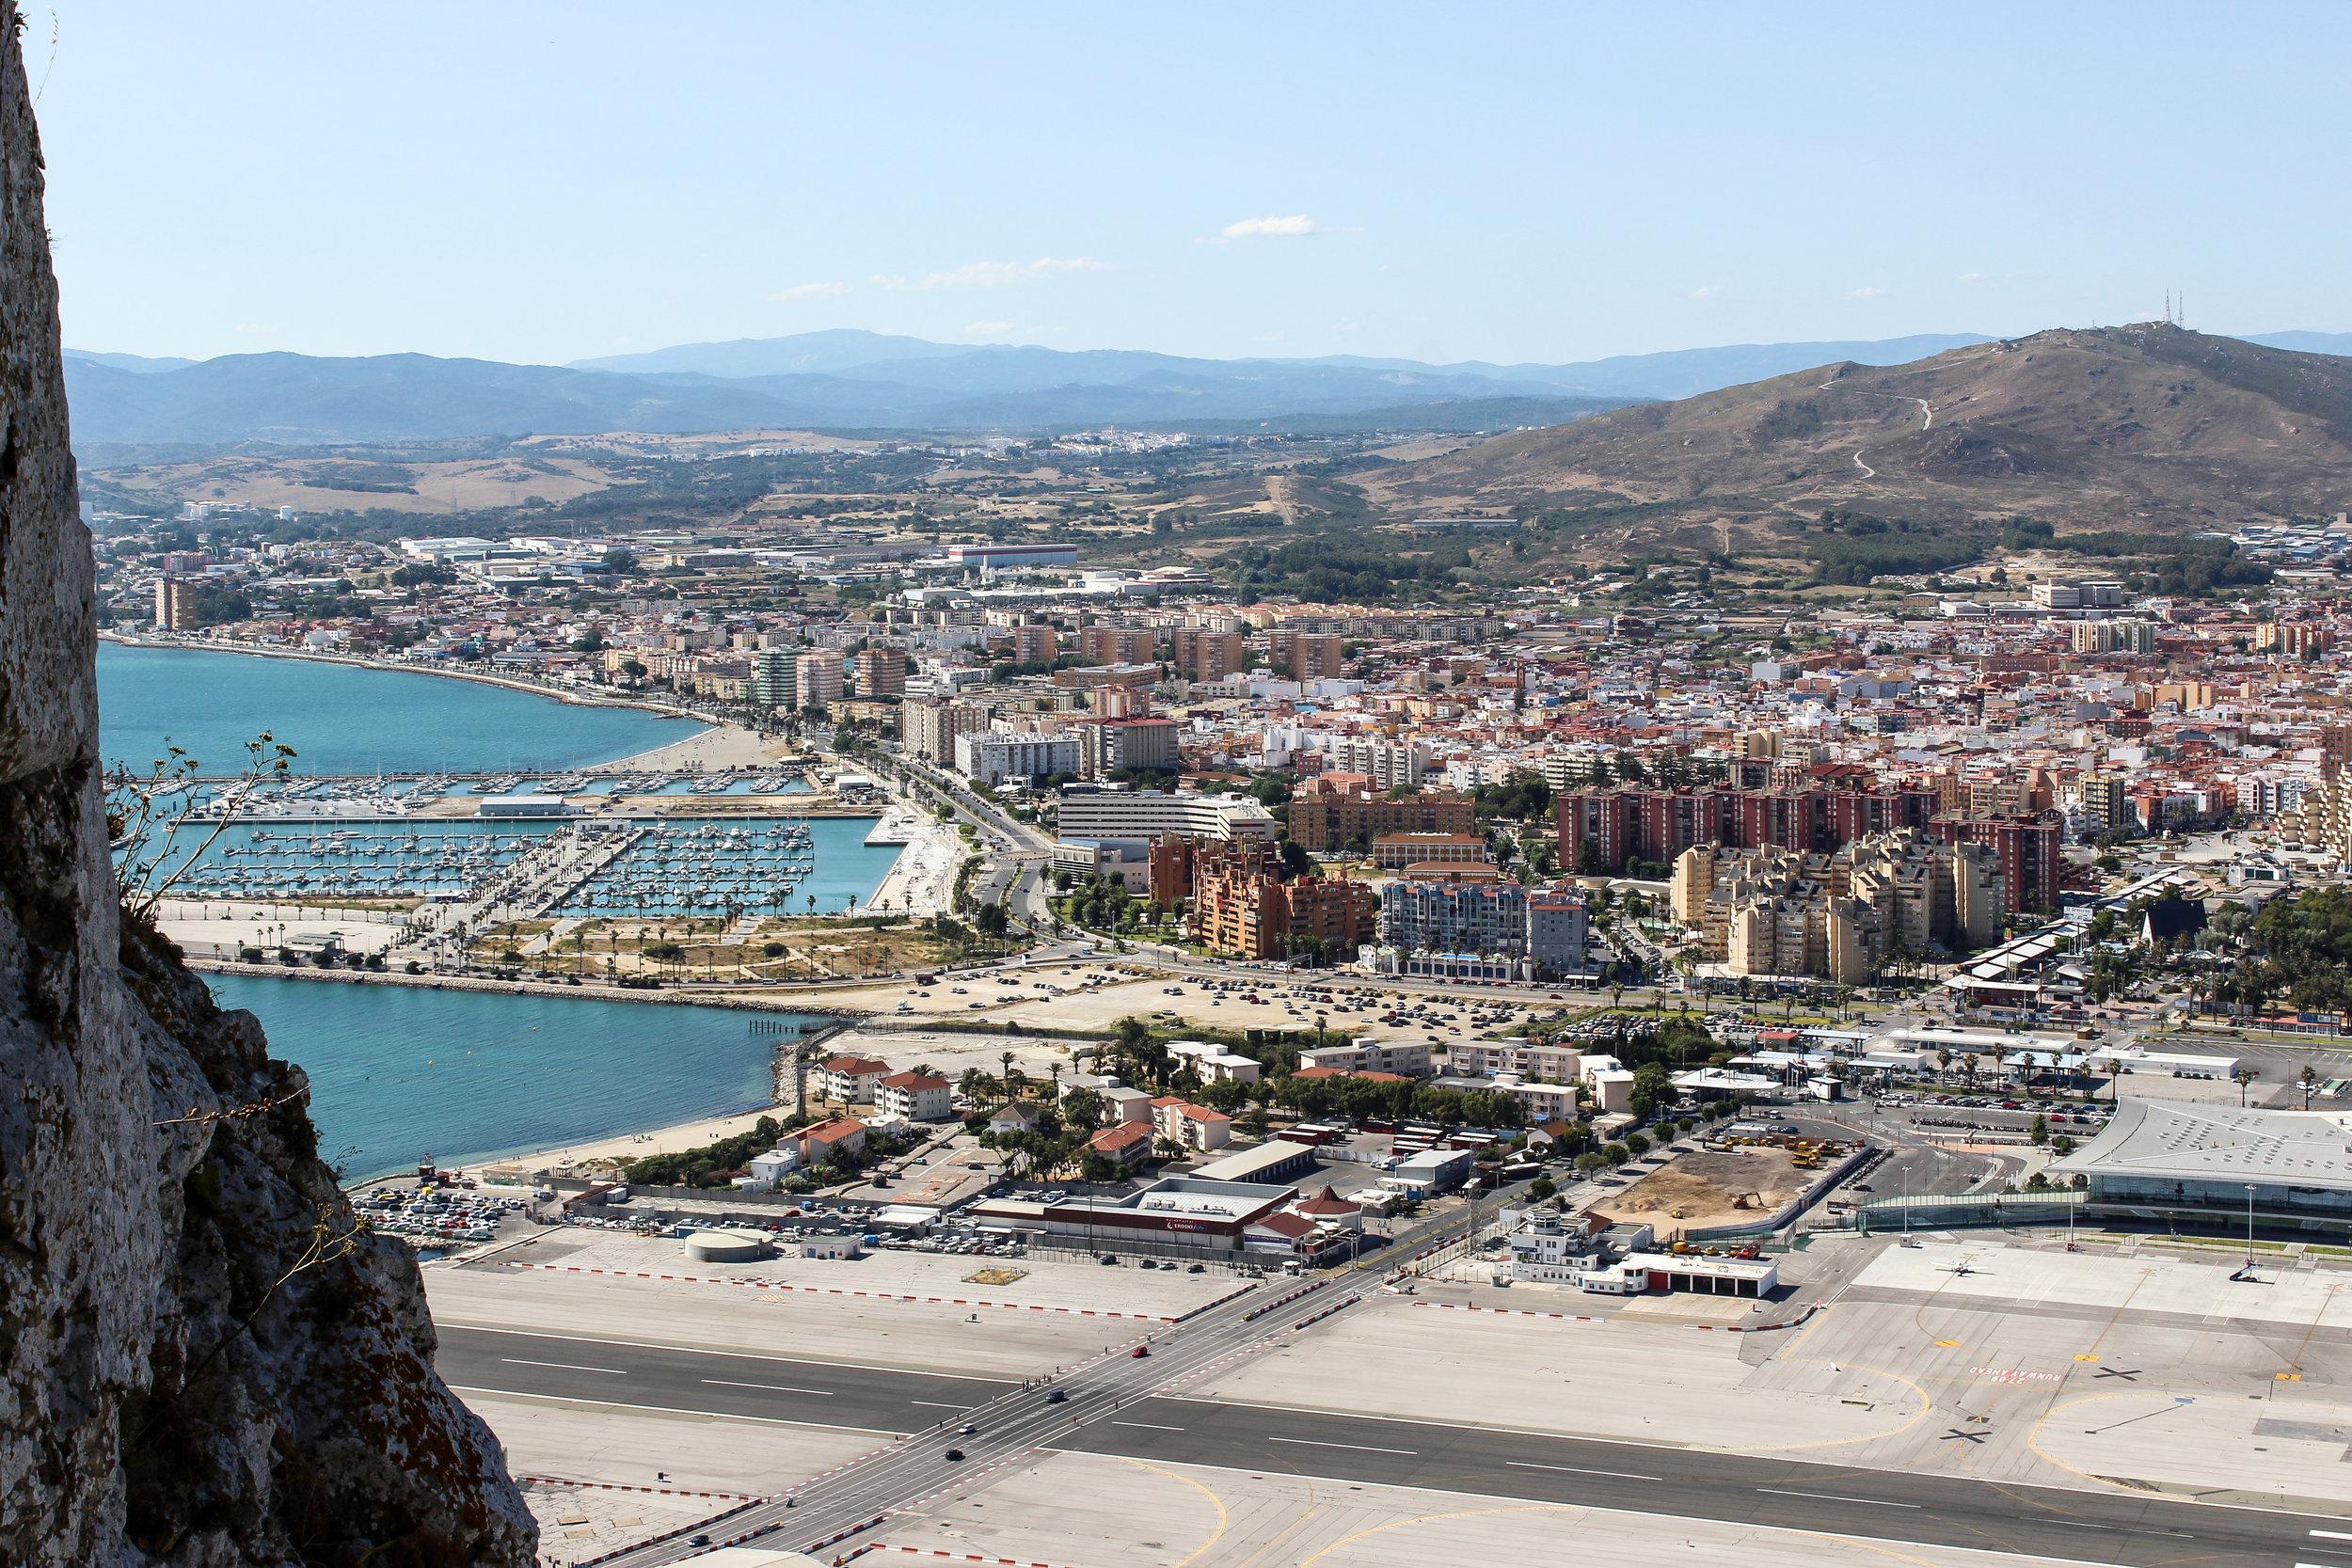 Gibraltar-Spain border, La Linea de la Concepcion, Cádiz, Andalusia, Spain, Mediterranean Sea, Gibraltar International Airport, Gibraltar, British Overseas Territory, Europe  | www.DoLessGetMoreDone.com |